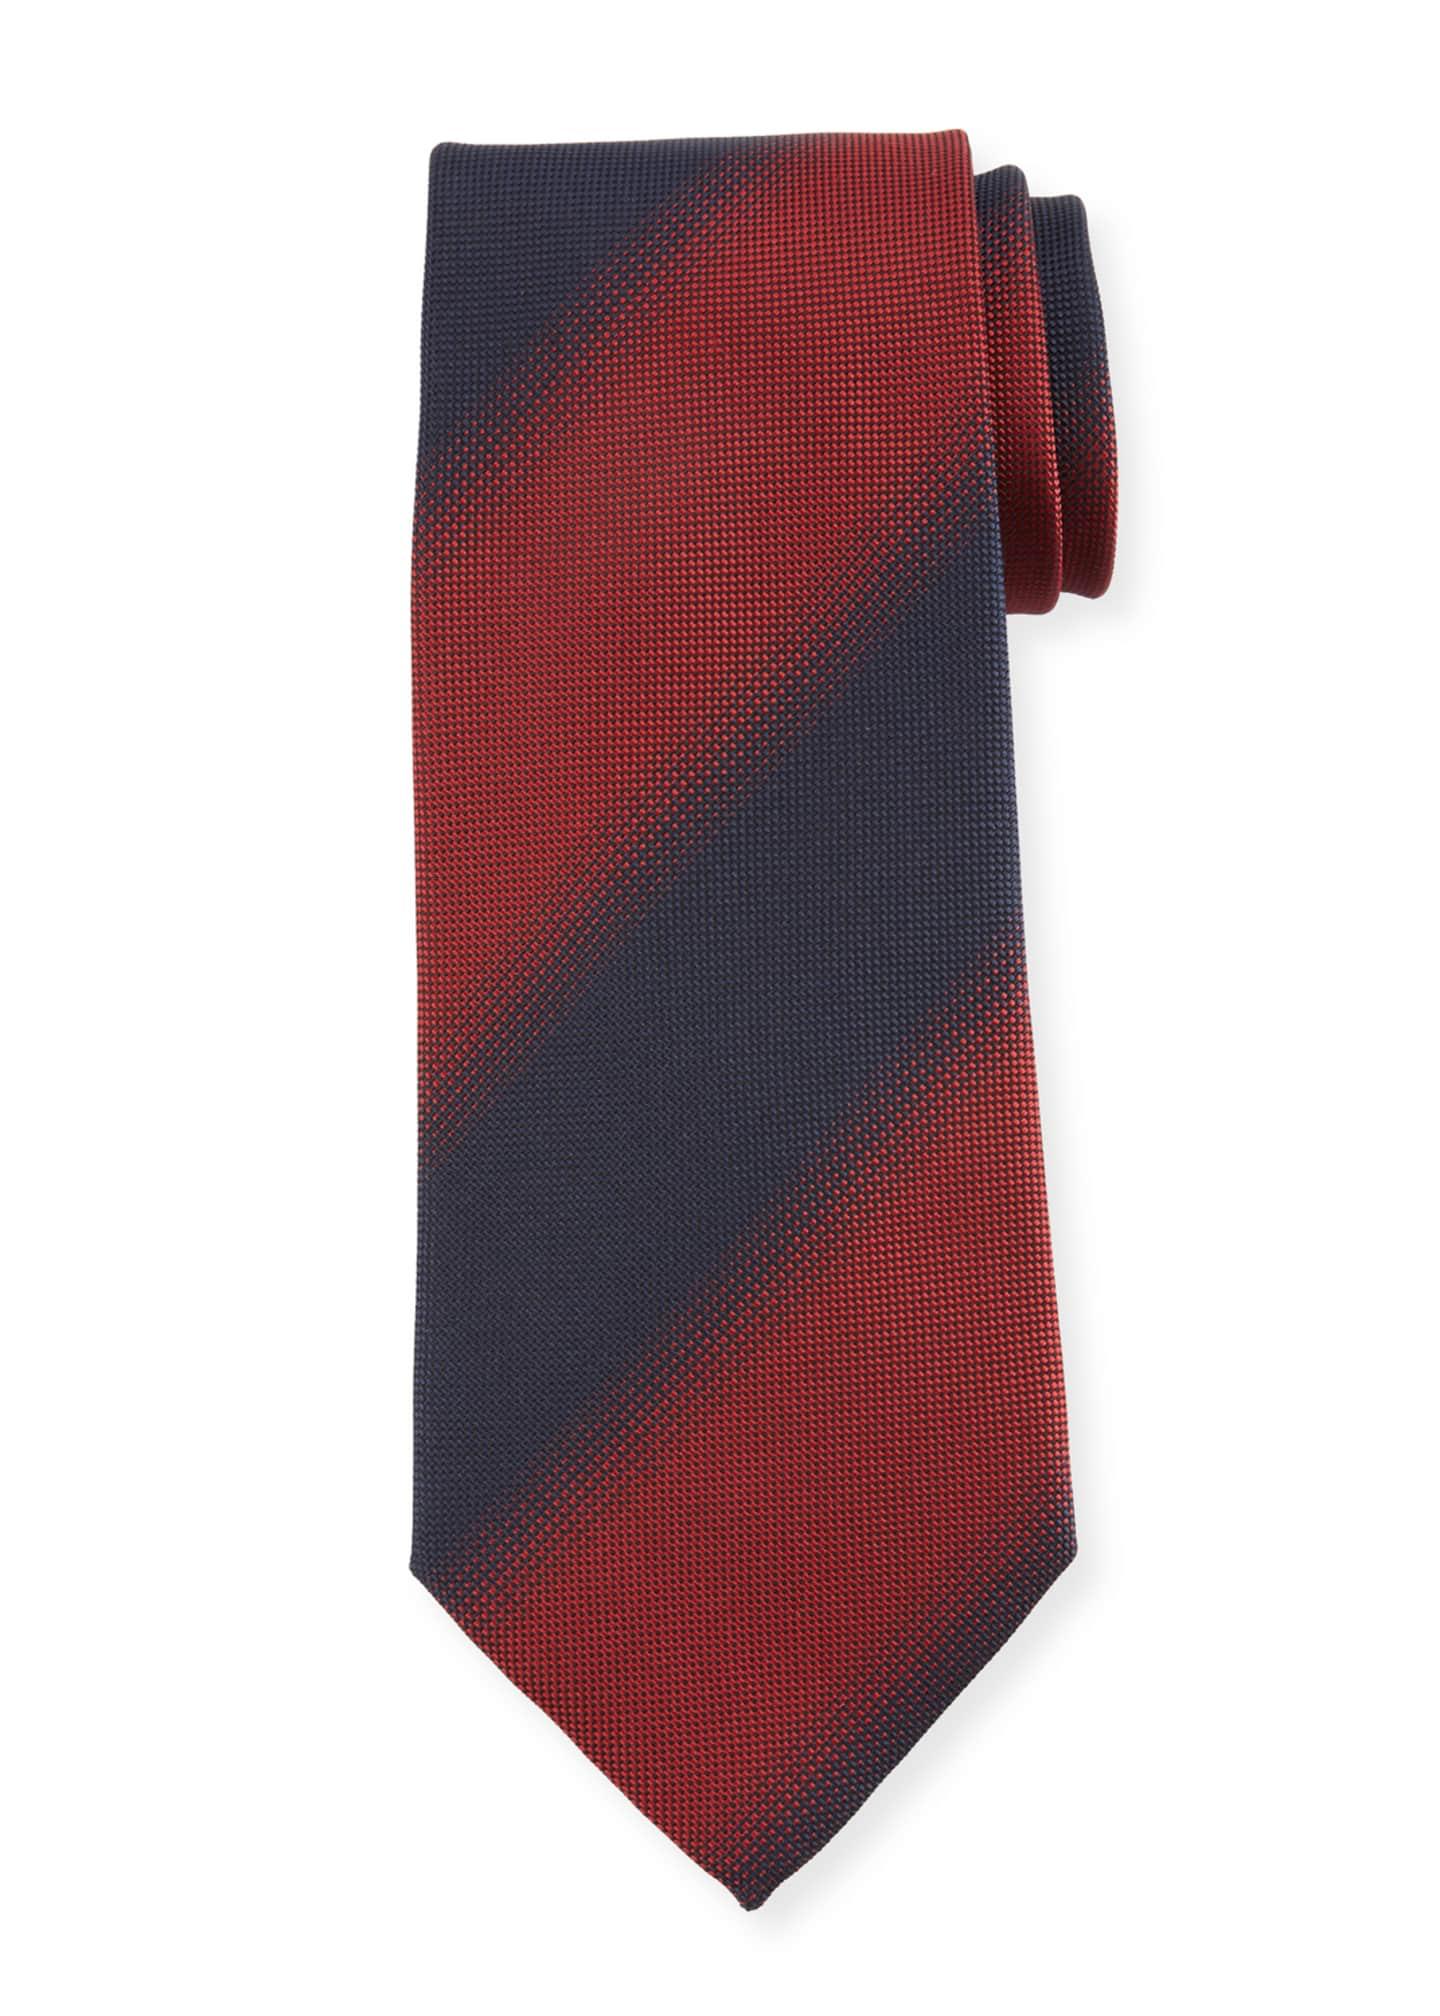 Ermenegildo Zegna Shadow Striped Silk Tie, Red